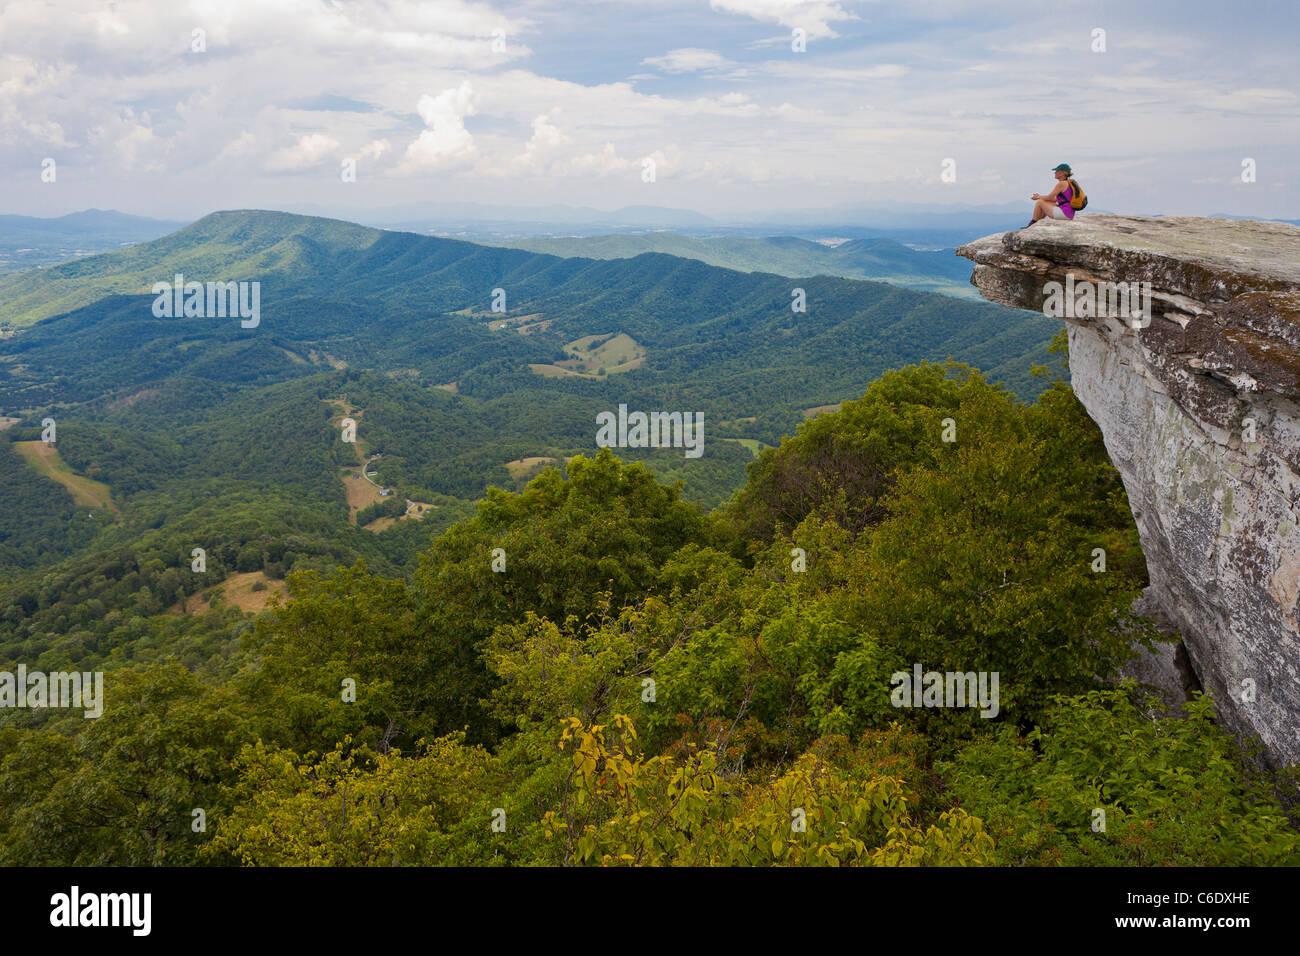 APPALACHIAN TRAIL, VIRGINIA, USA - Woman hiker at McAfee Knob on Catawba Mountain, near city of Roanoke. - Stock Image